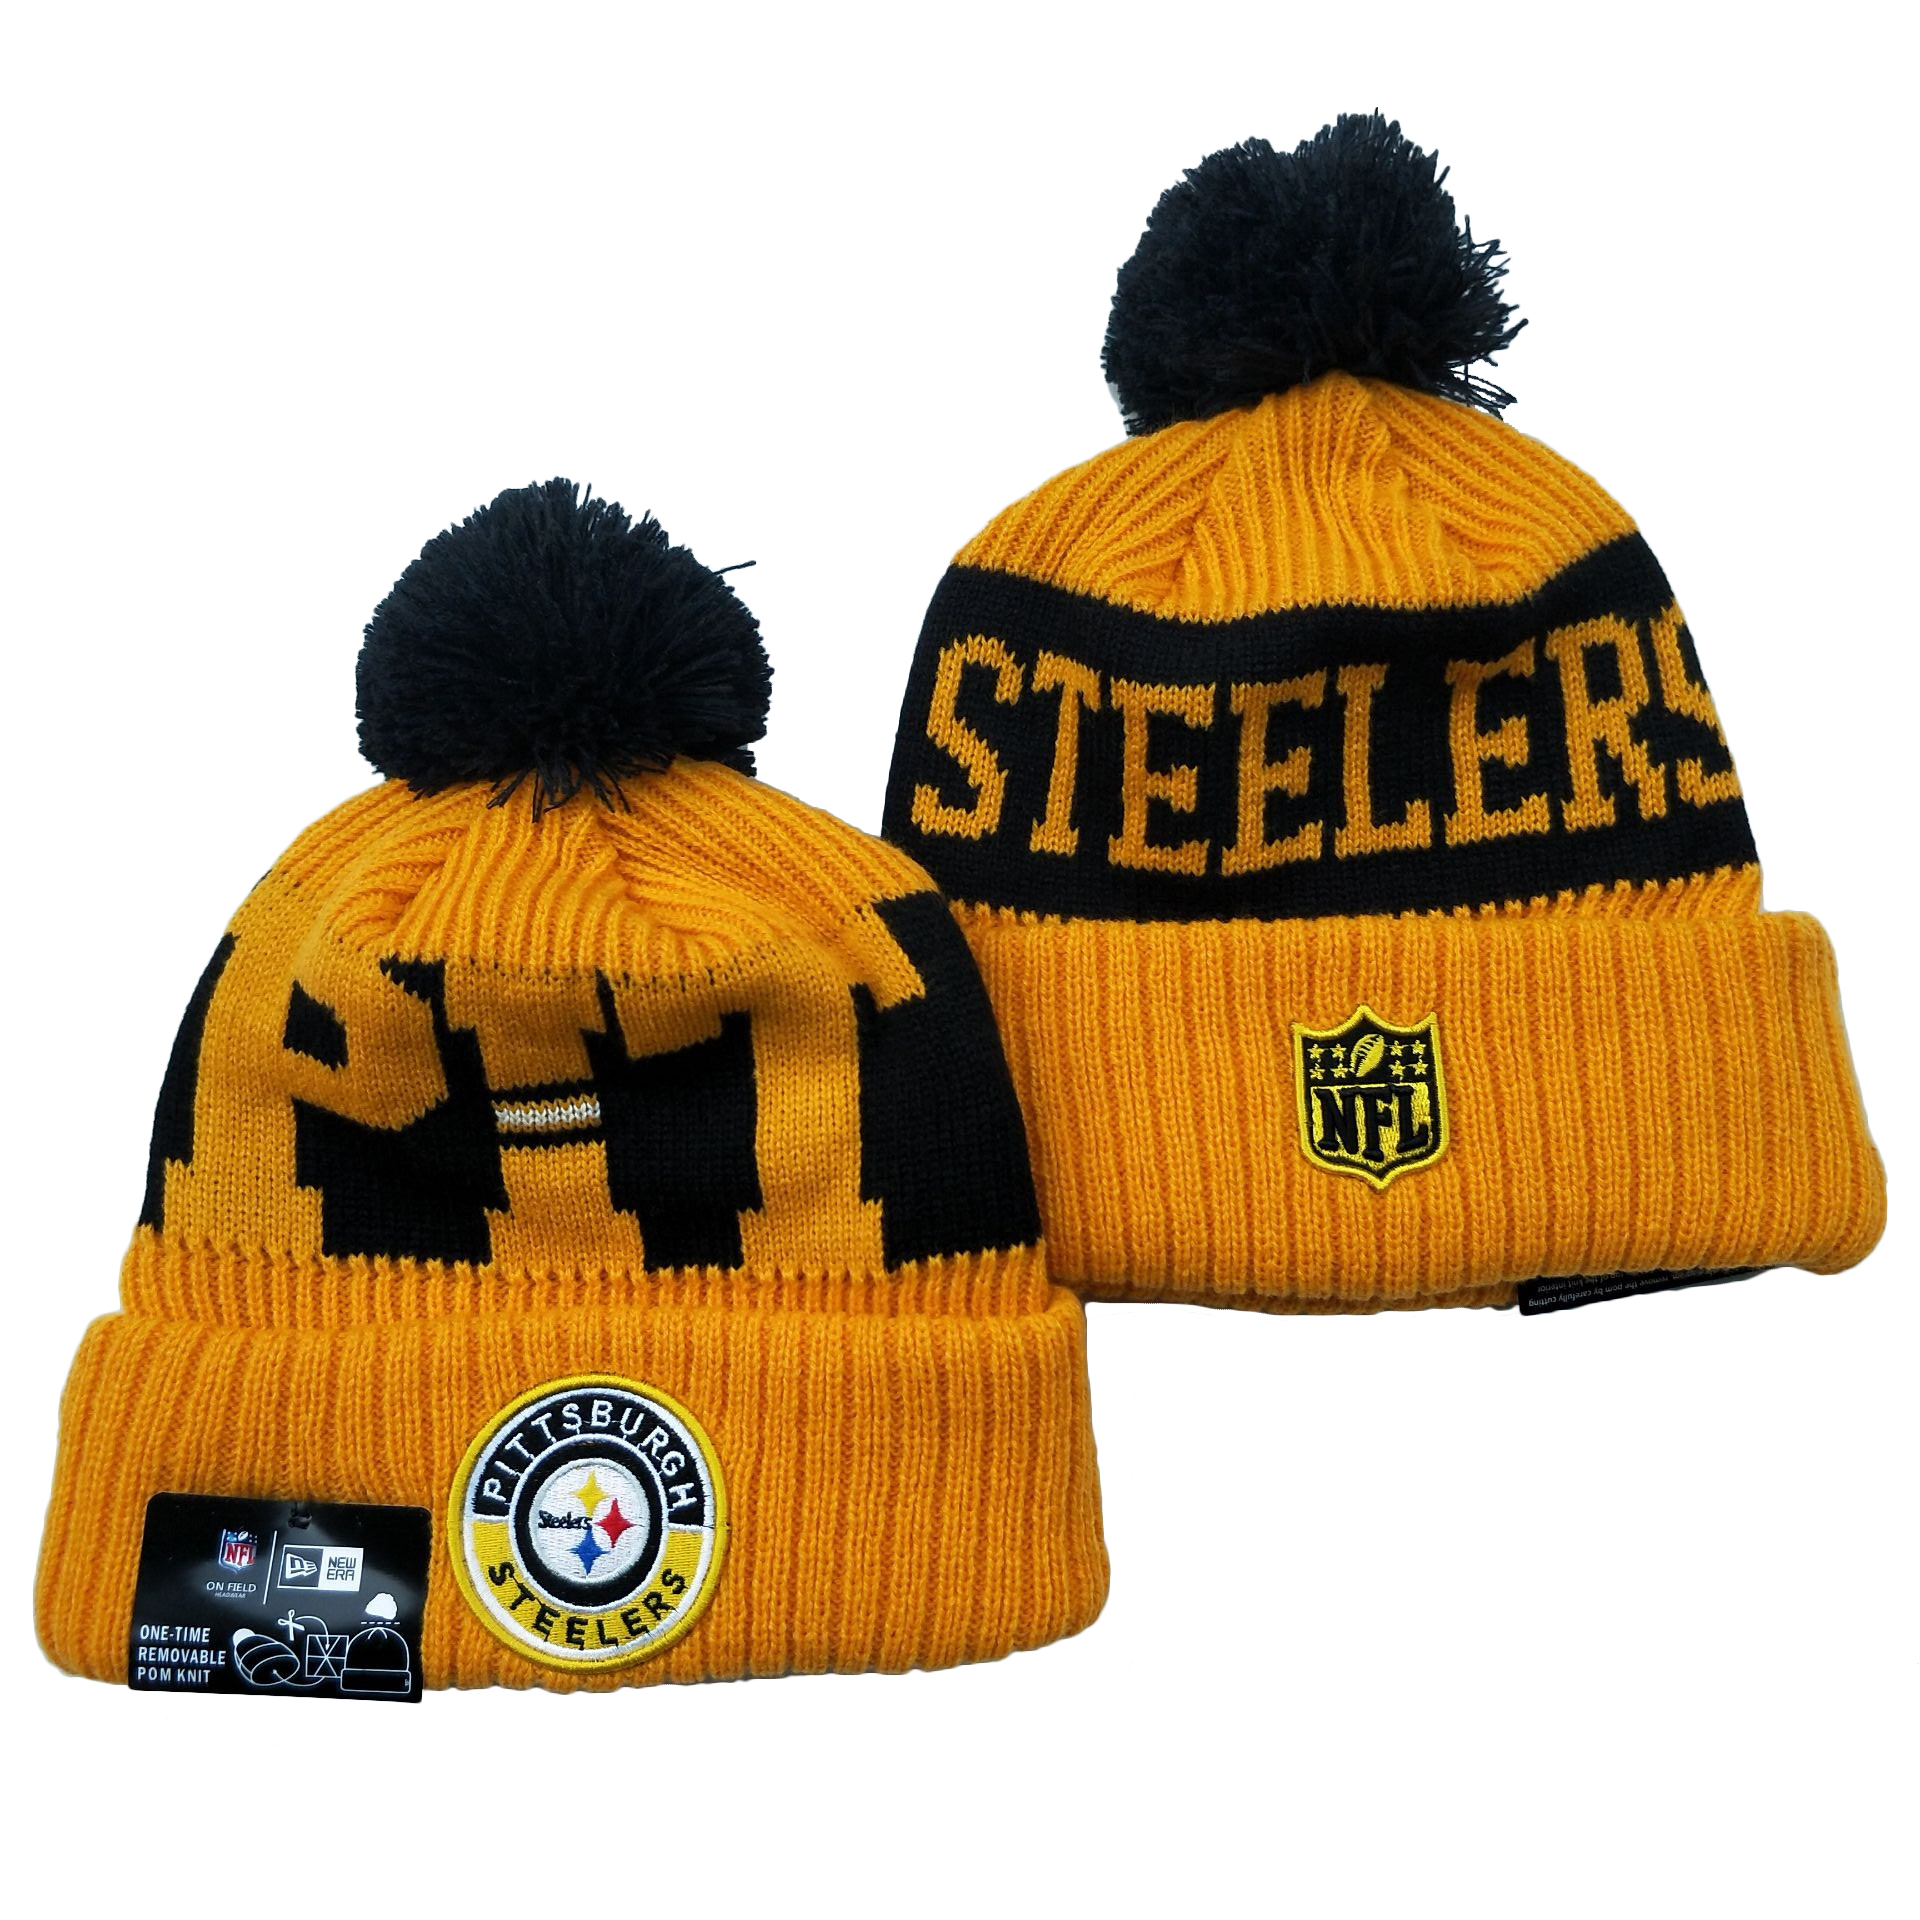 Steelers Team Logo Yellow 2020 NFL Sideline Pom Cuffed Knit Hat YD